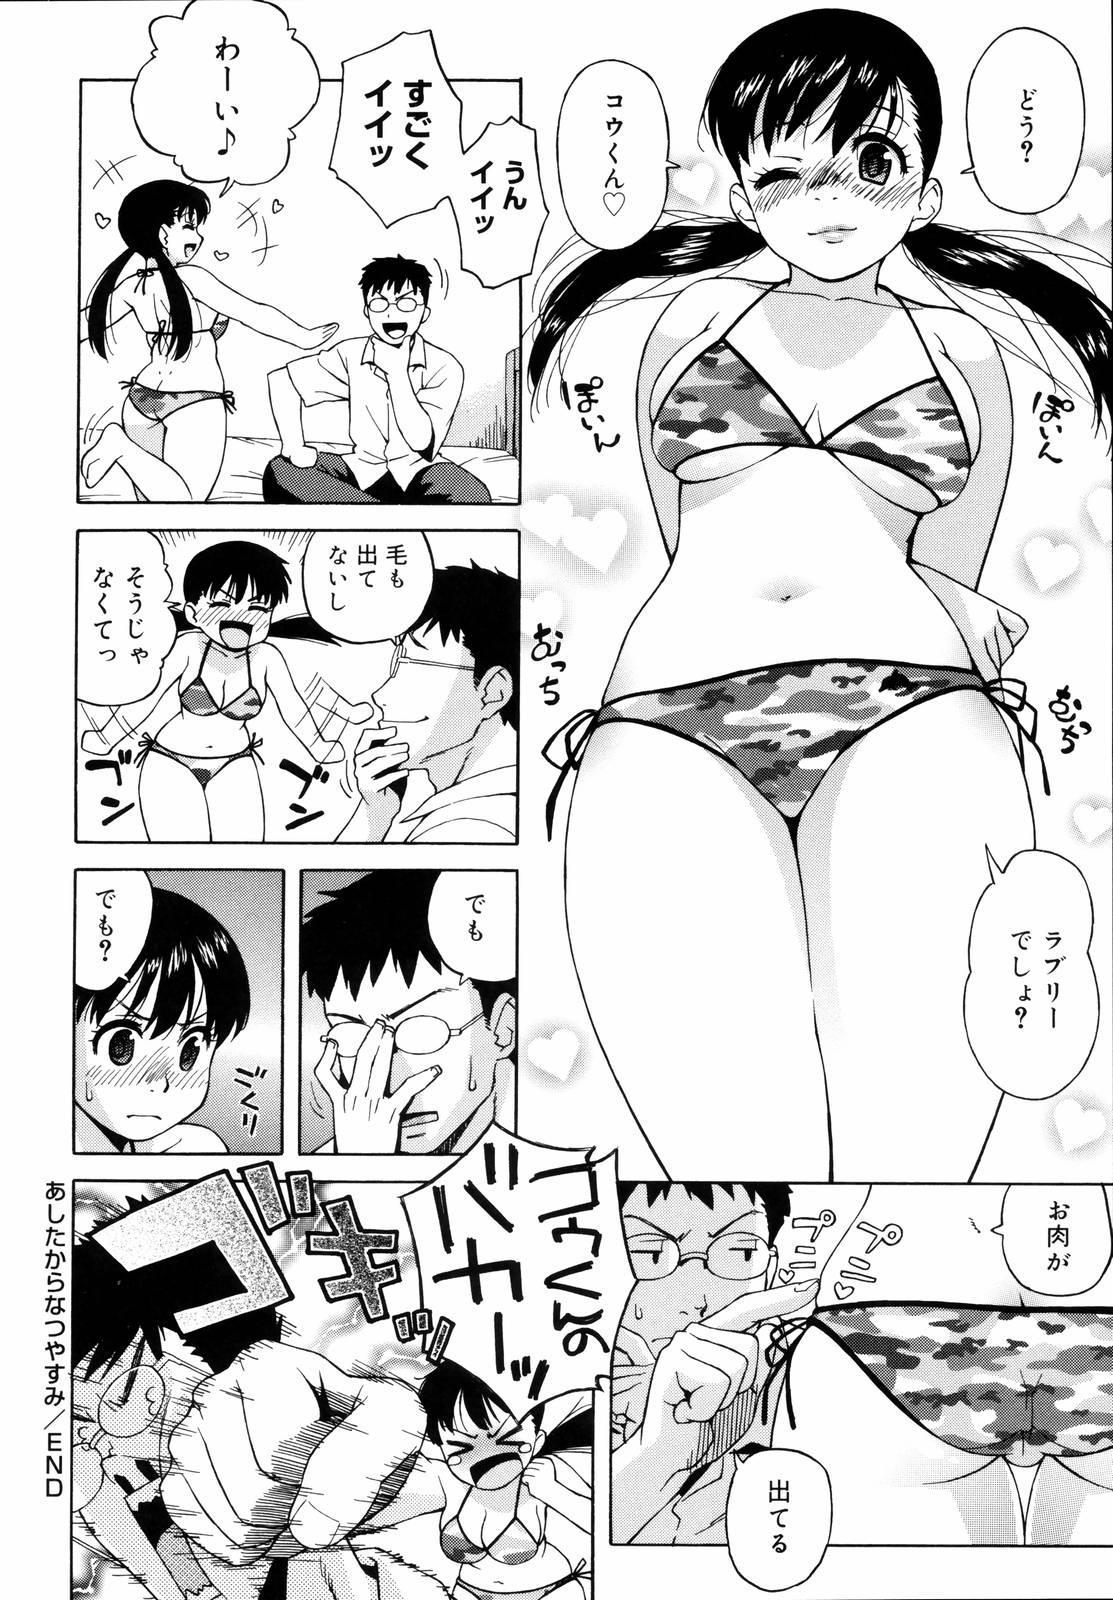 Shishunki wa Hatsujouki - Adolescence is a sexual excitement period. 105